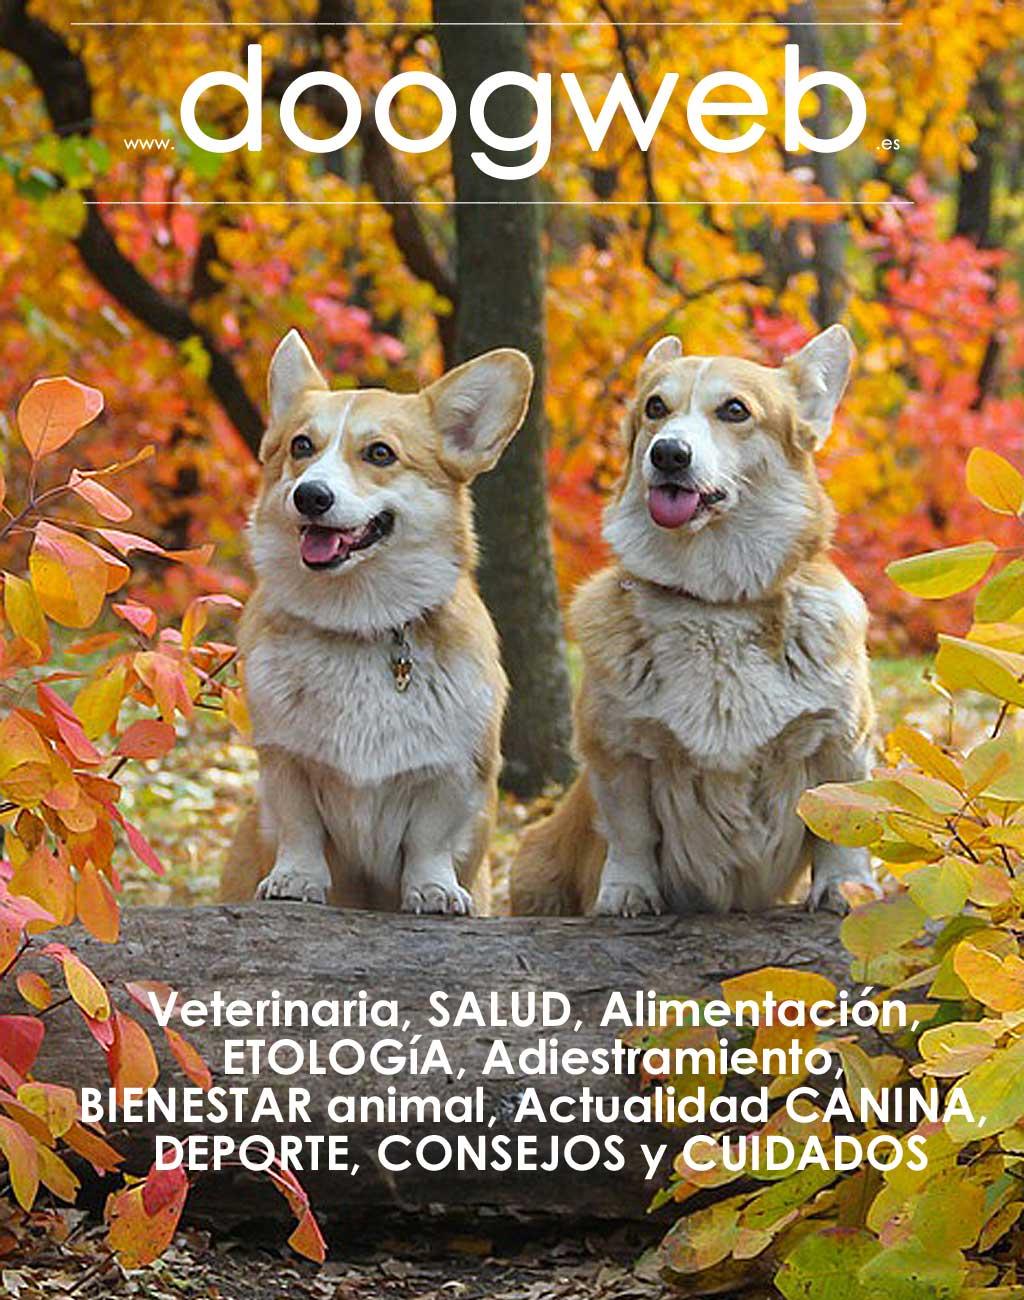 Revista gratis doogweb nº 96, agosto 2020.